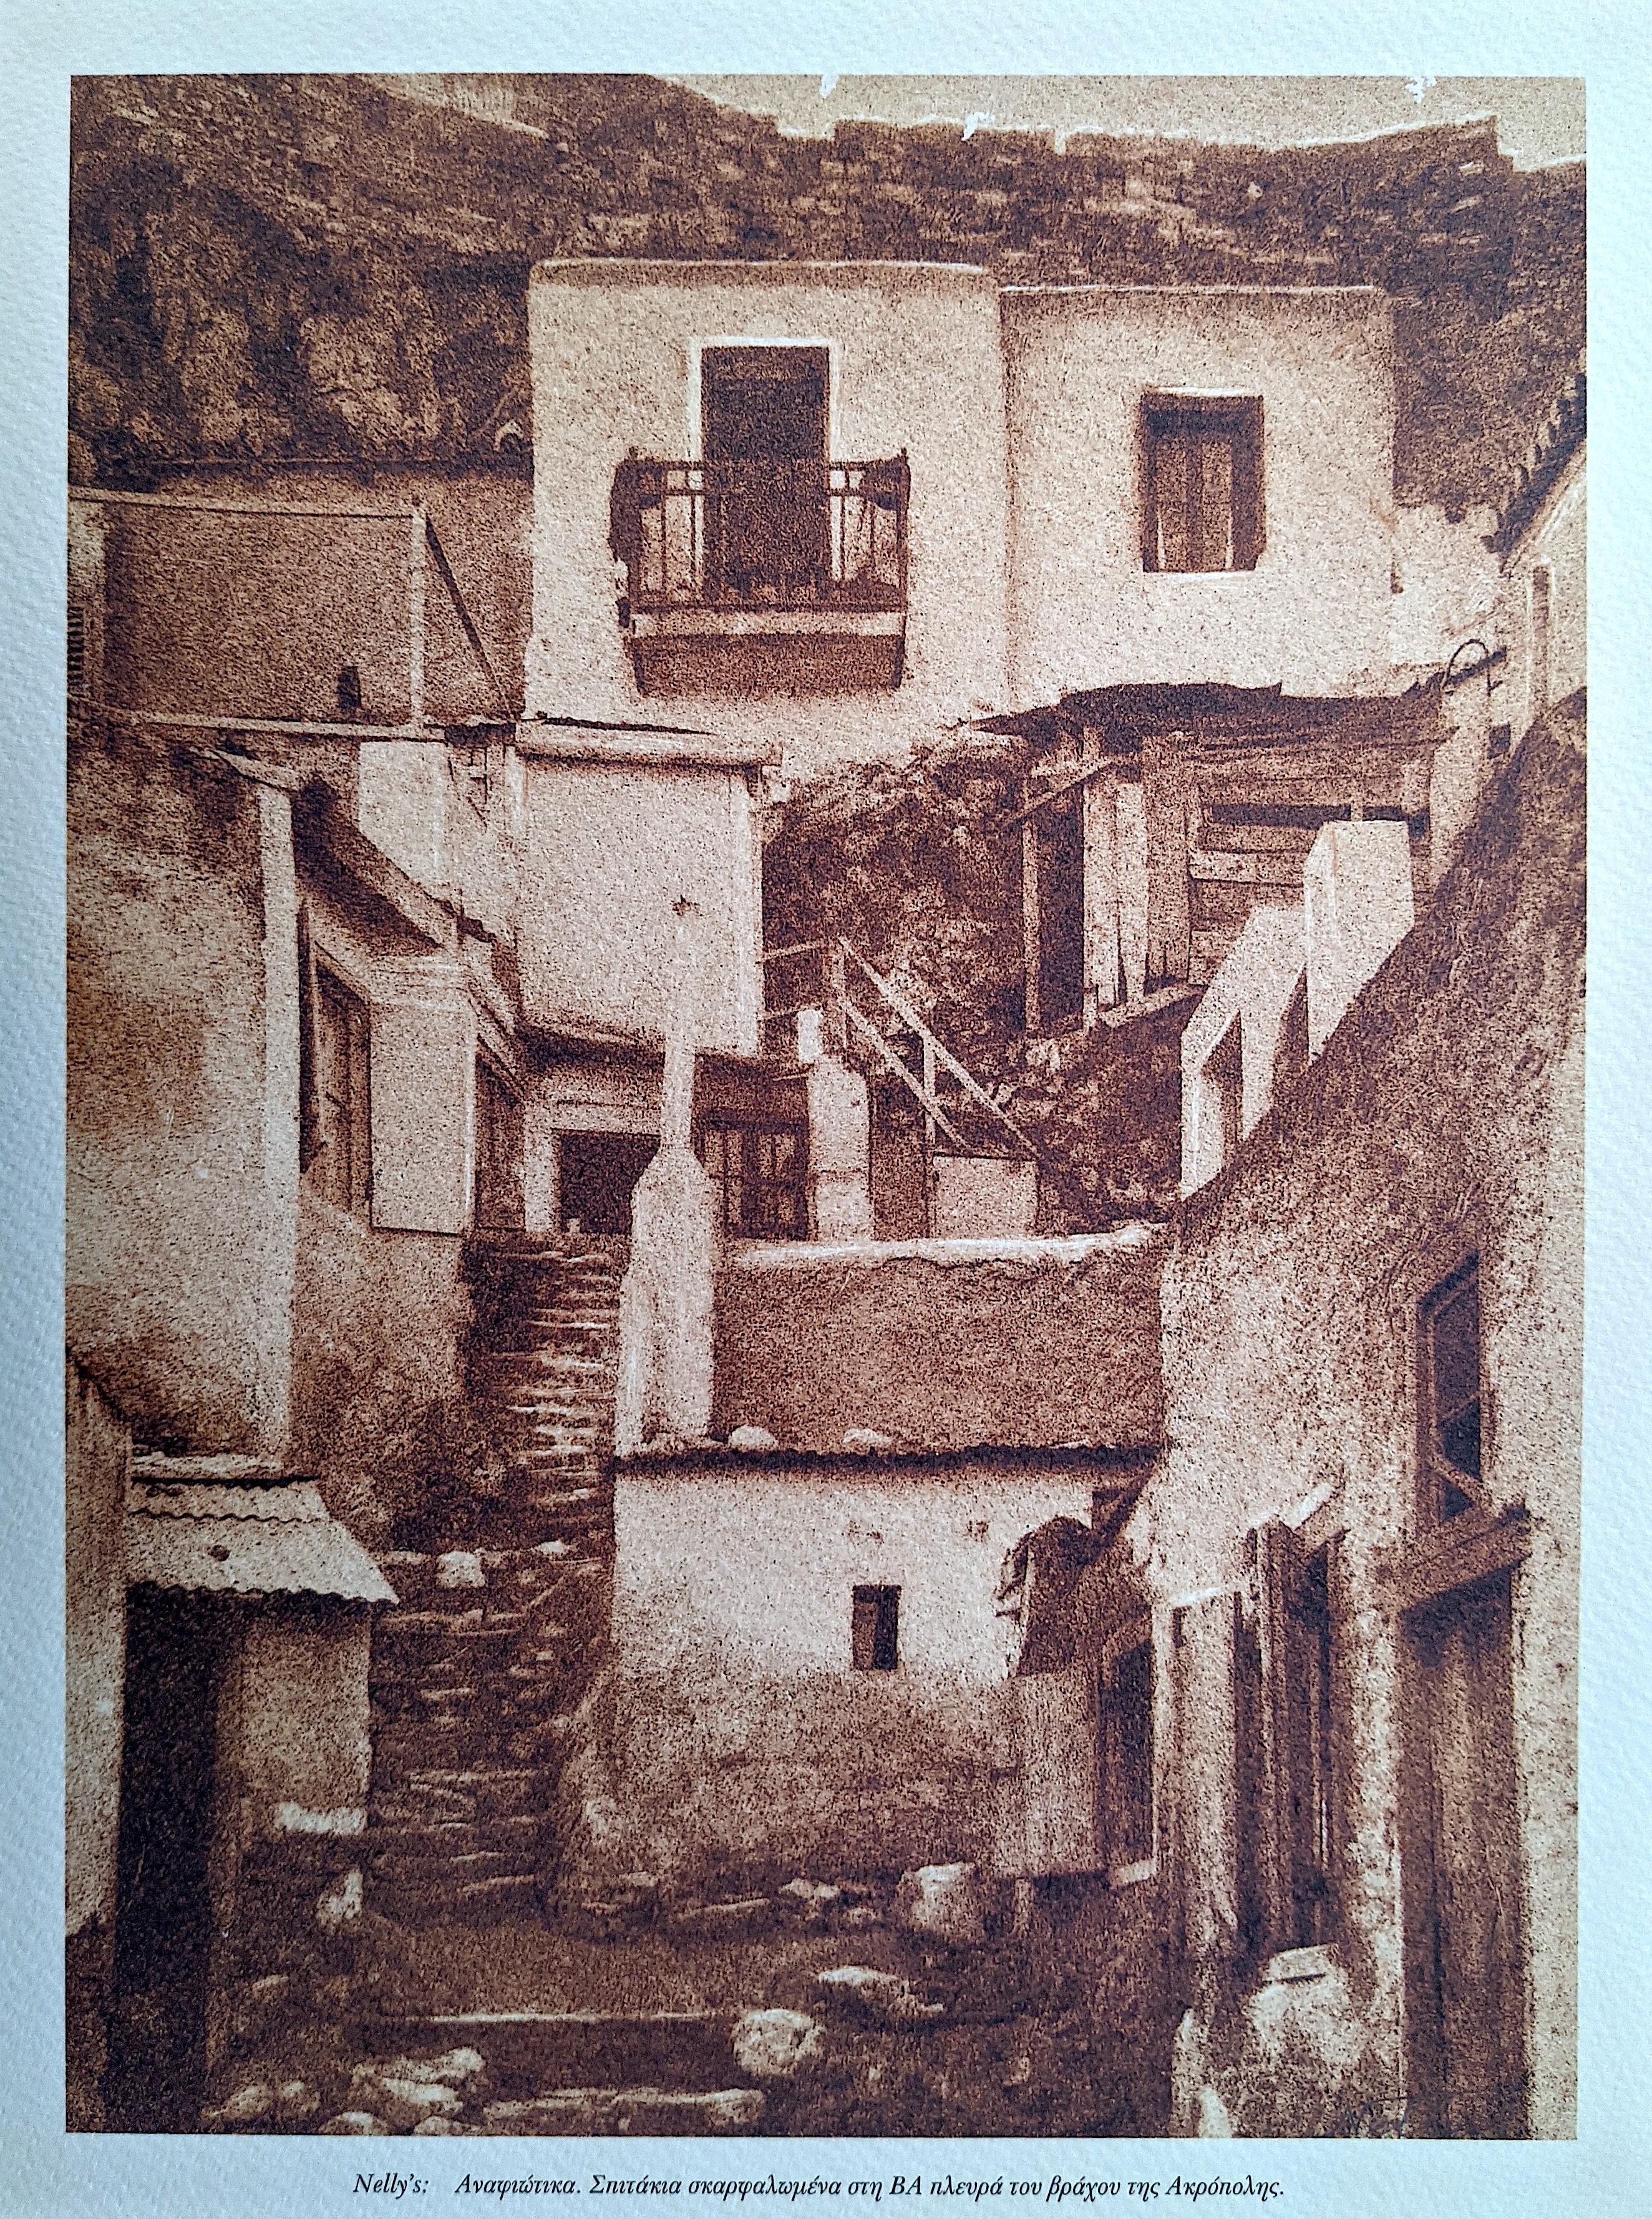 NELLY SOUYOULTZOGLOU-SERAIDARI Small Houses Clinging